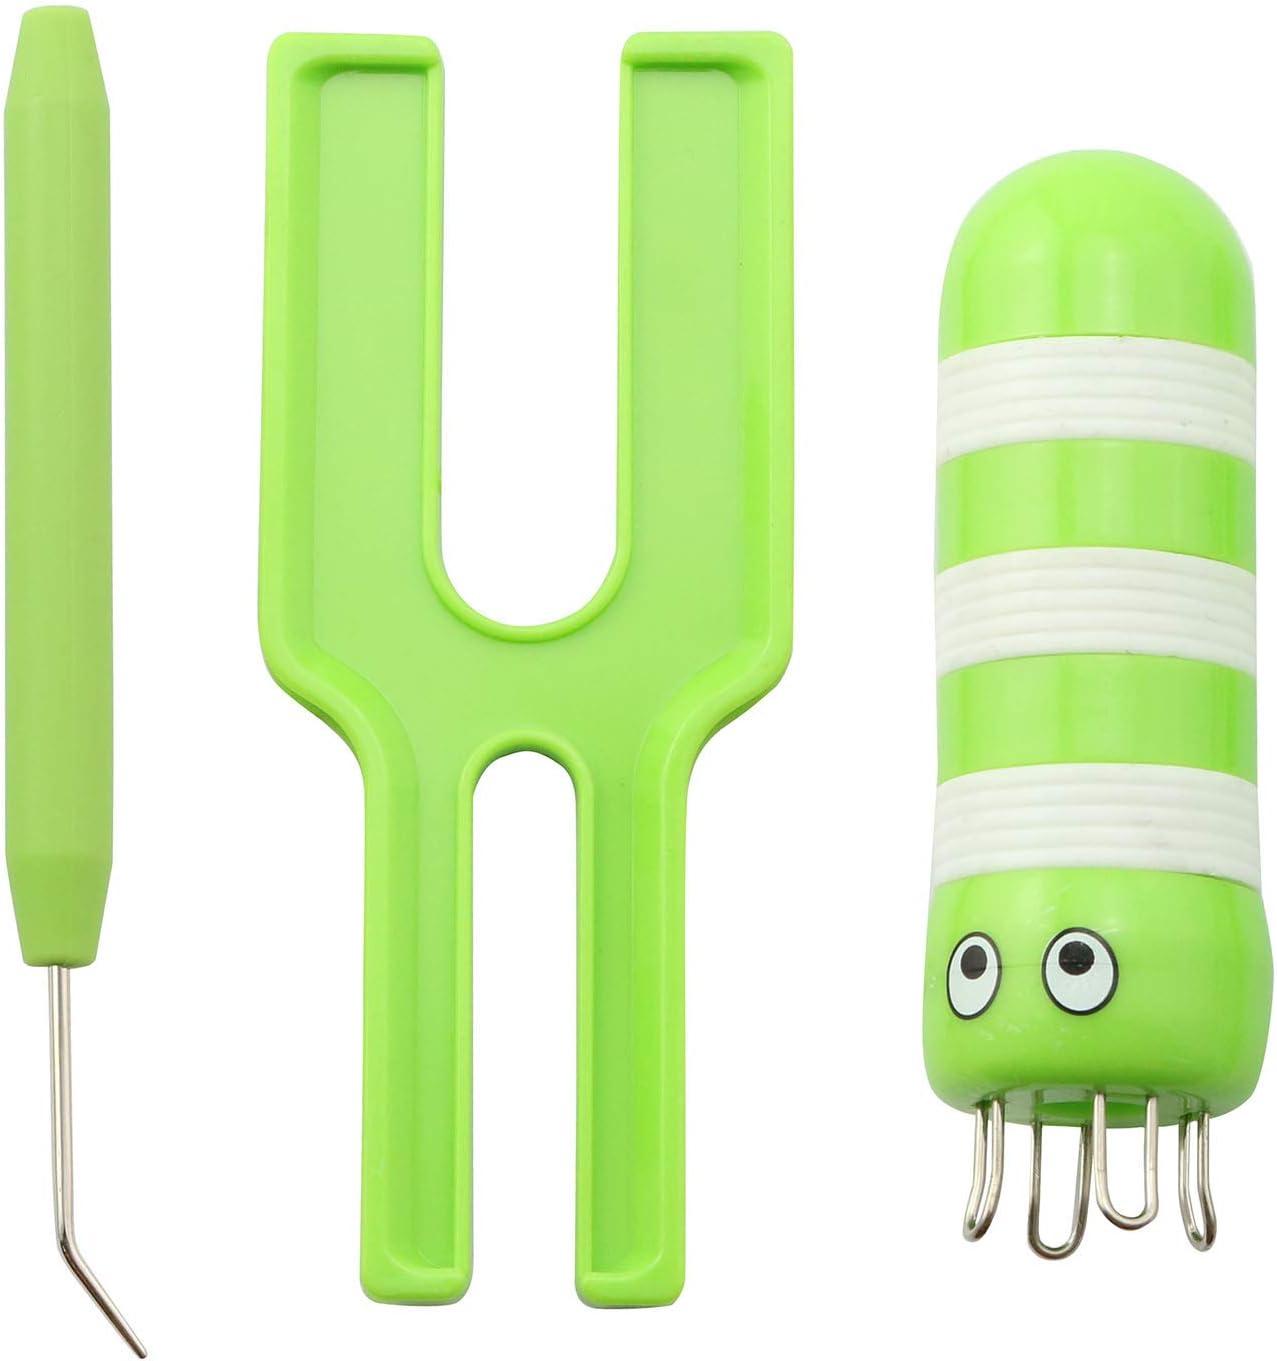 NX Garden 3IN1 Knitting Loom Set (1x Knitting Loom + 1x Awl + 1x Dual-Size Wo-Wo Maker), Green